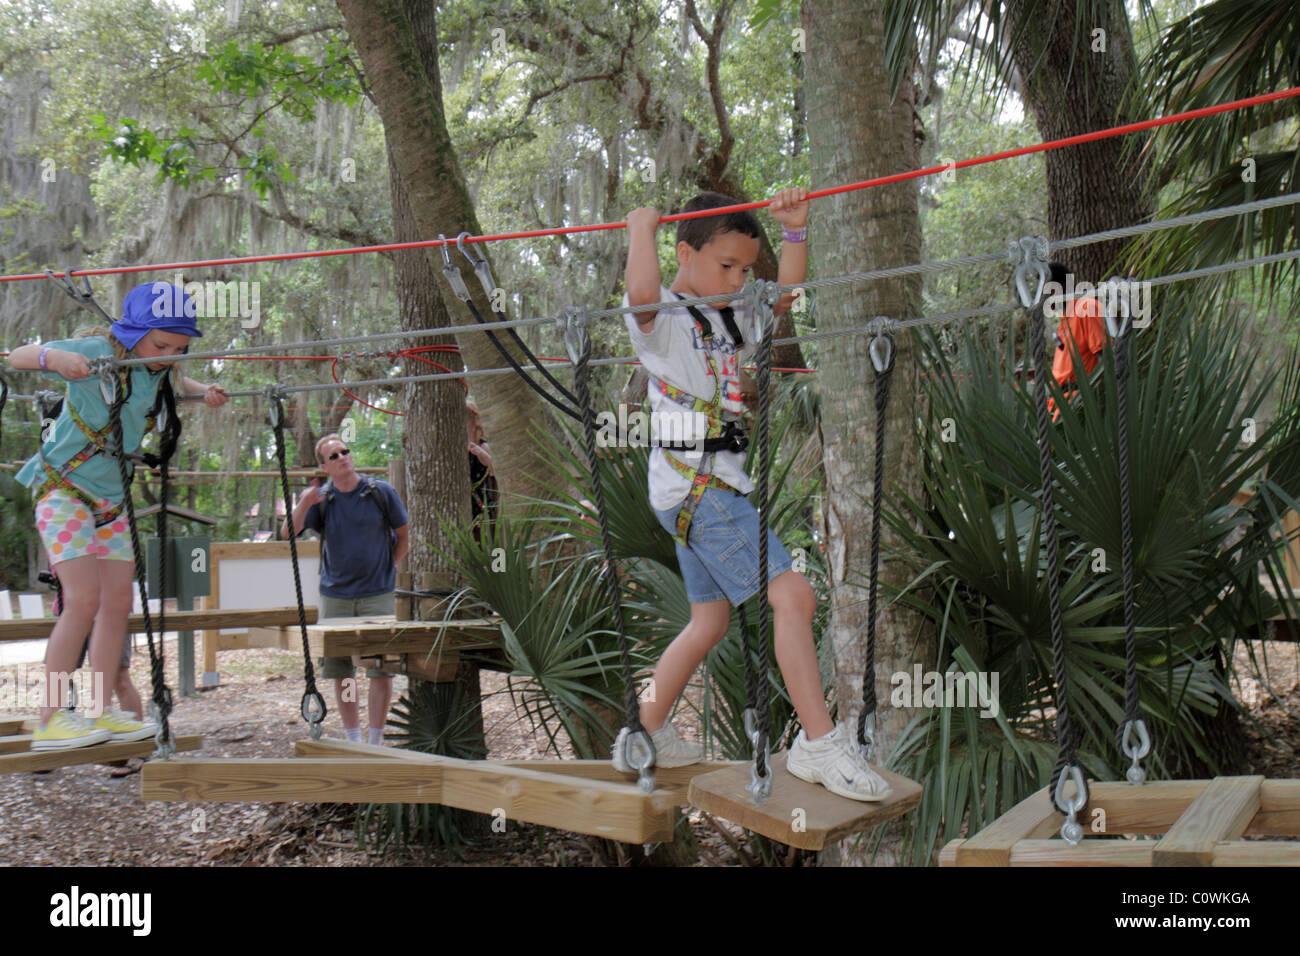 Orlando Florida Sanford Central Florida Zoo And Botanical Gardens Stock Photo Royalty Free